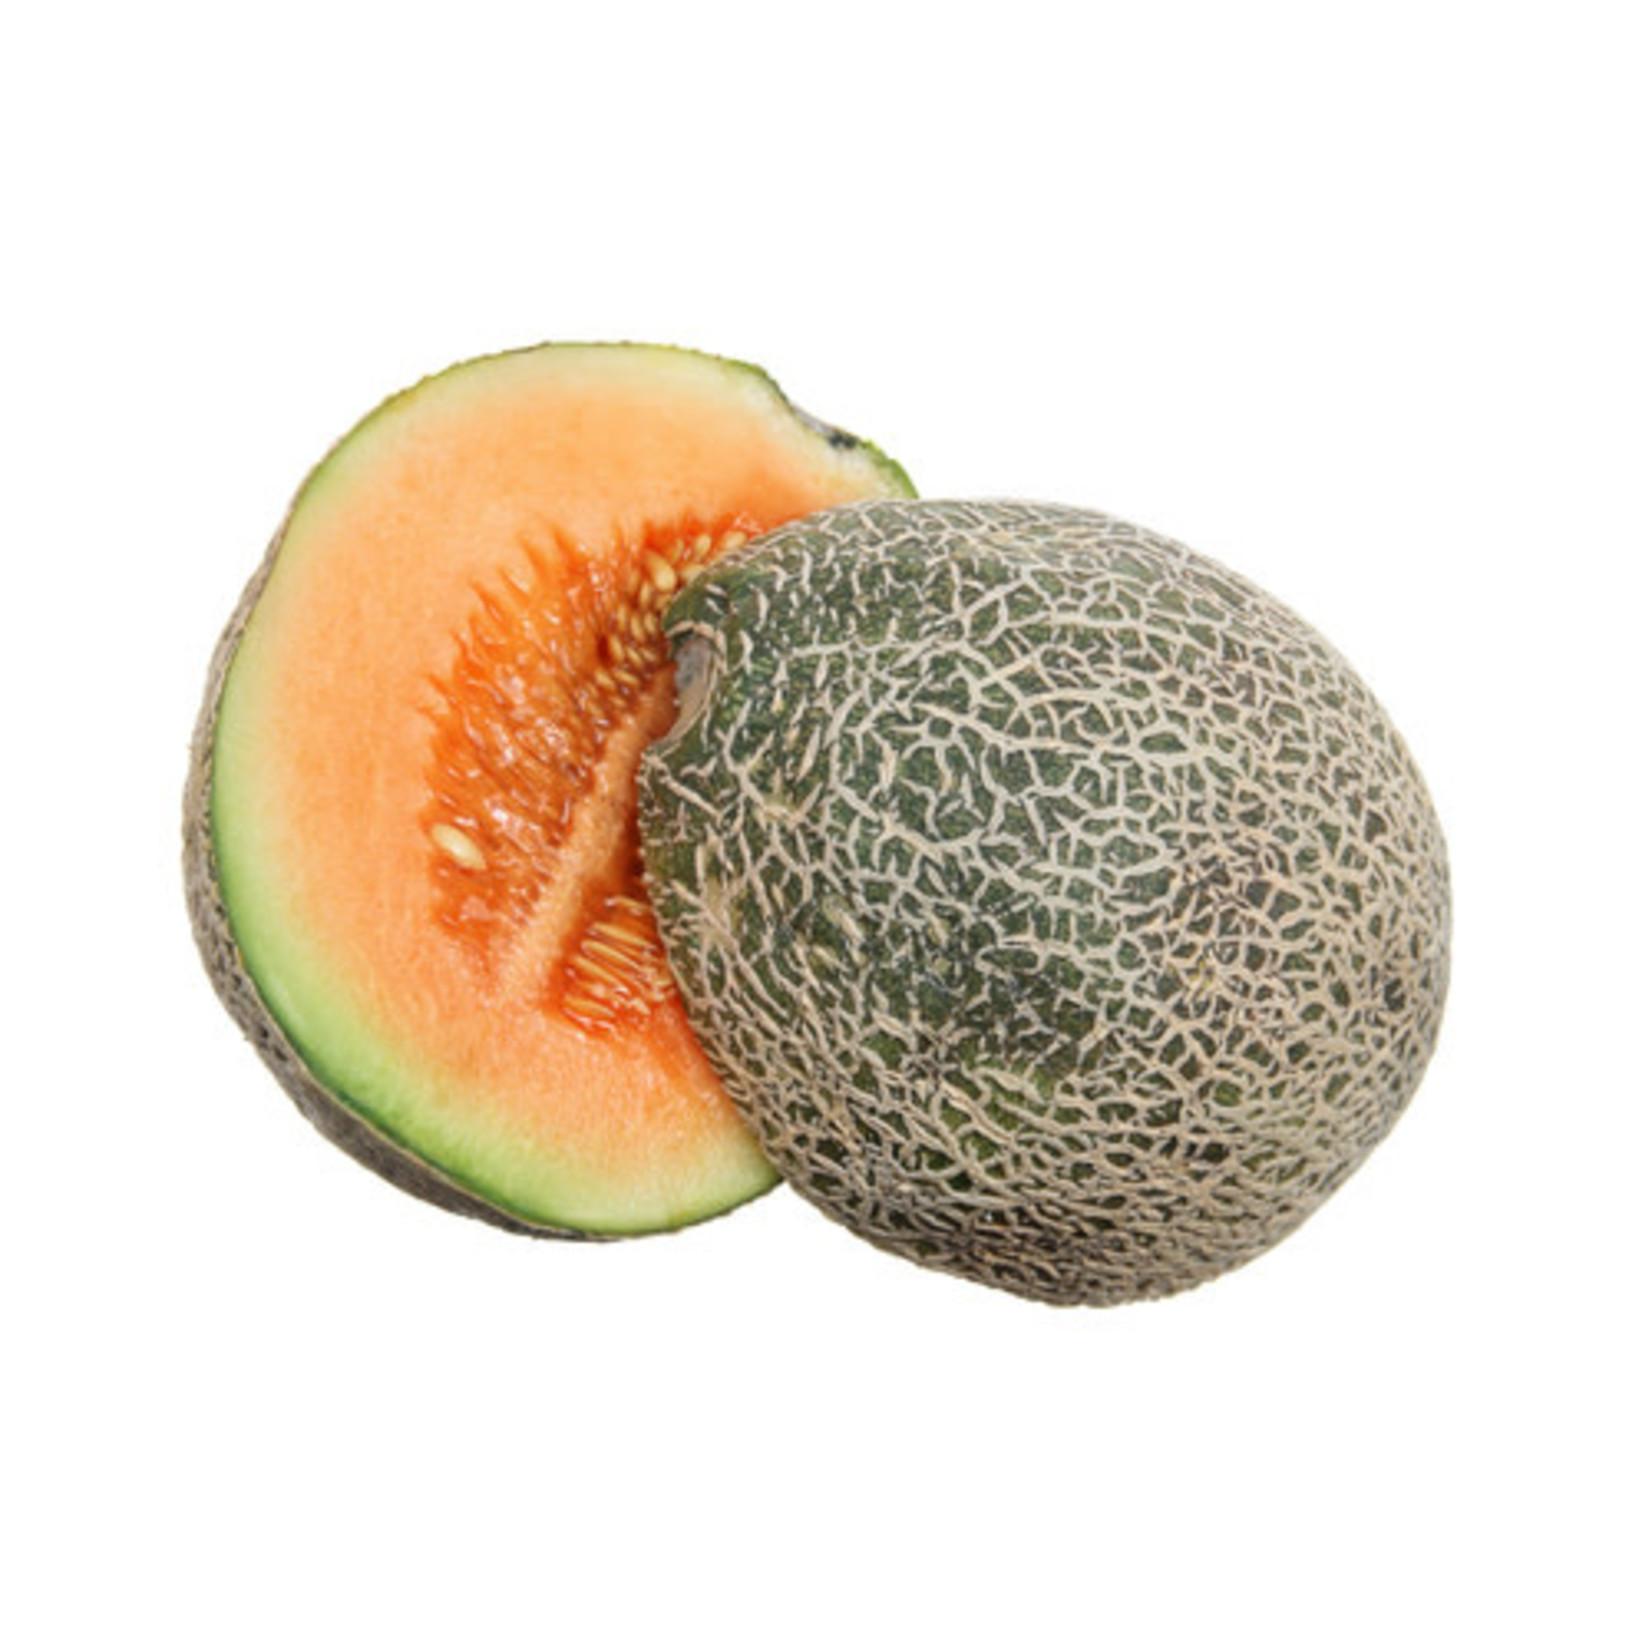 Cantaloupe (seed pkg)